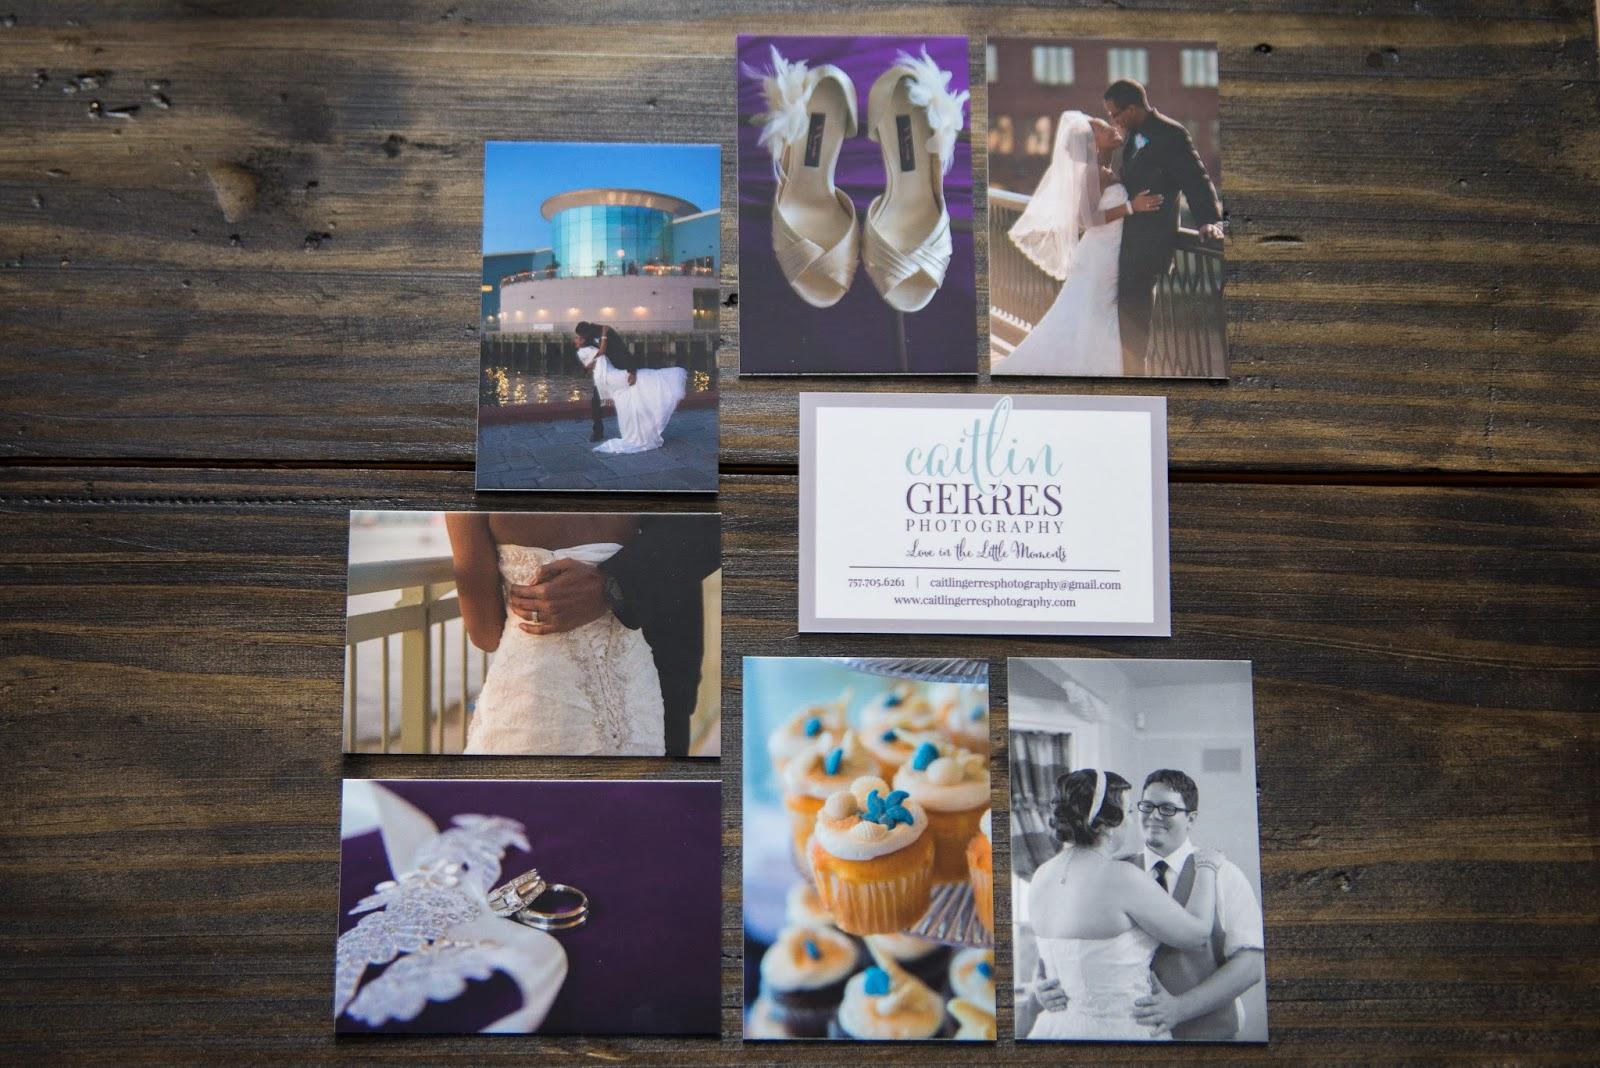 Caitlin+Gerres+Photography+Business+Cards-112.jpg